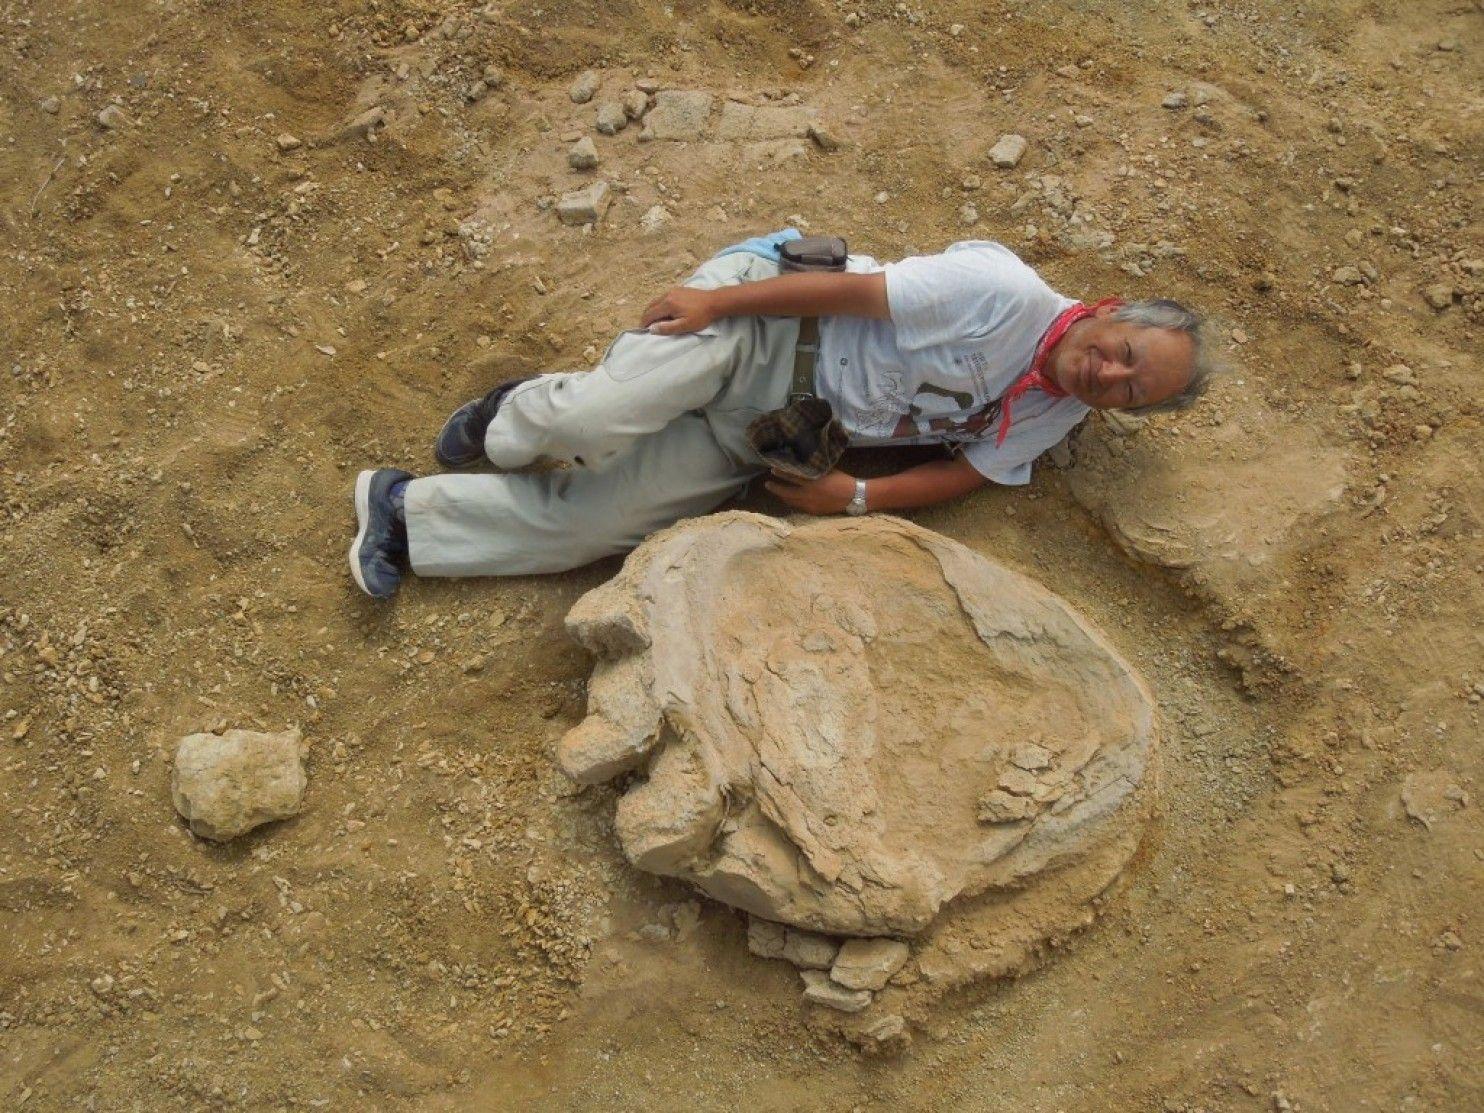 Huge Dinosaur Footprint Discovered In Gobi Desert Is